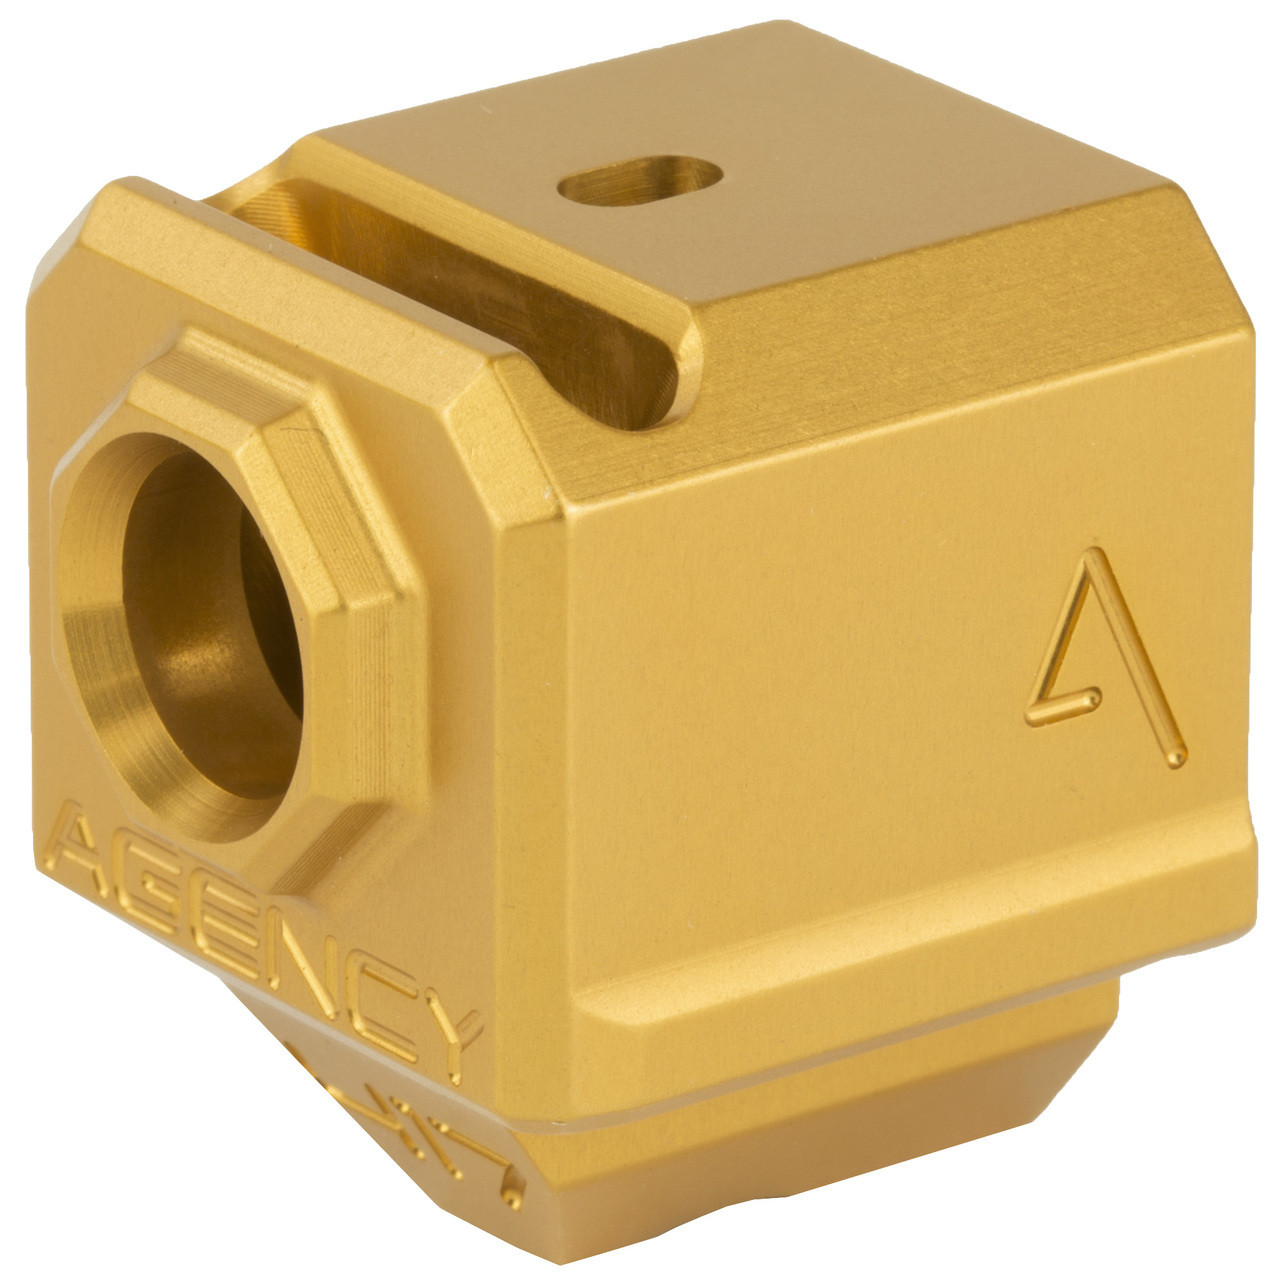 AGENCY ARMS Single Port 417 Gold Glock Compensator